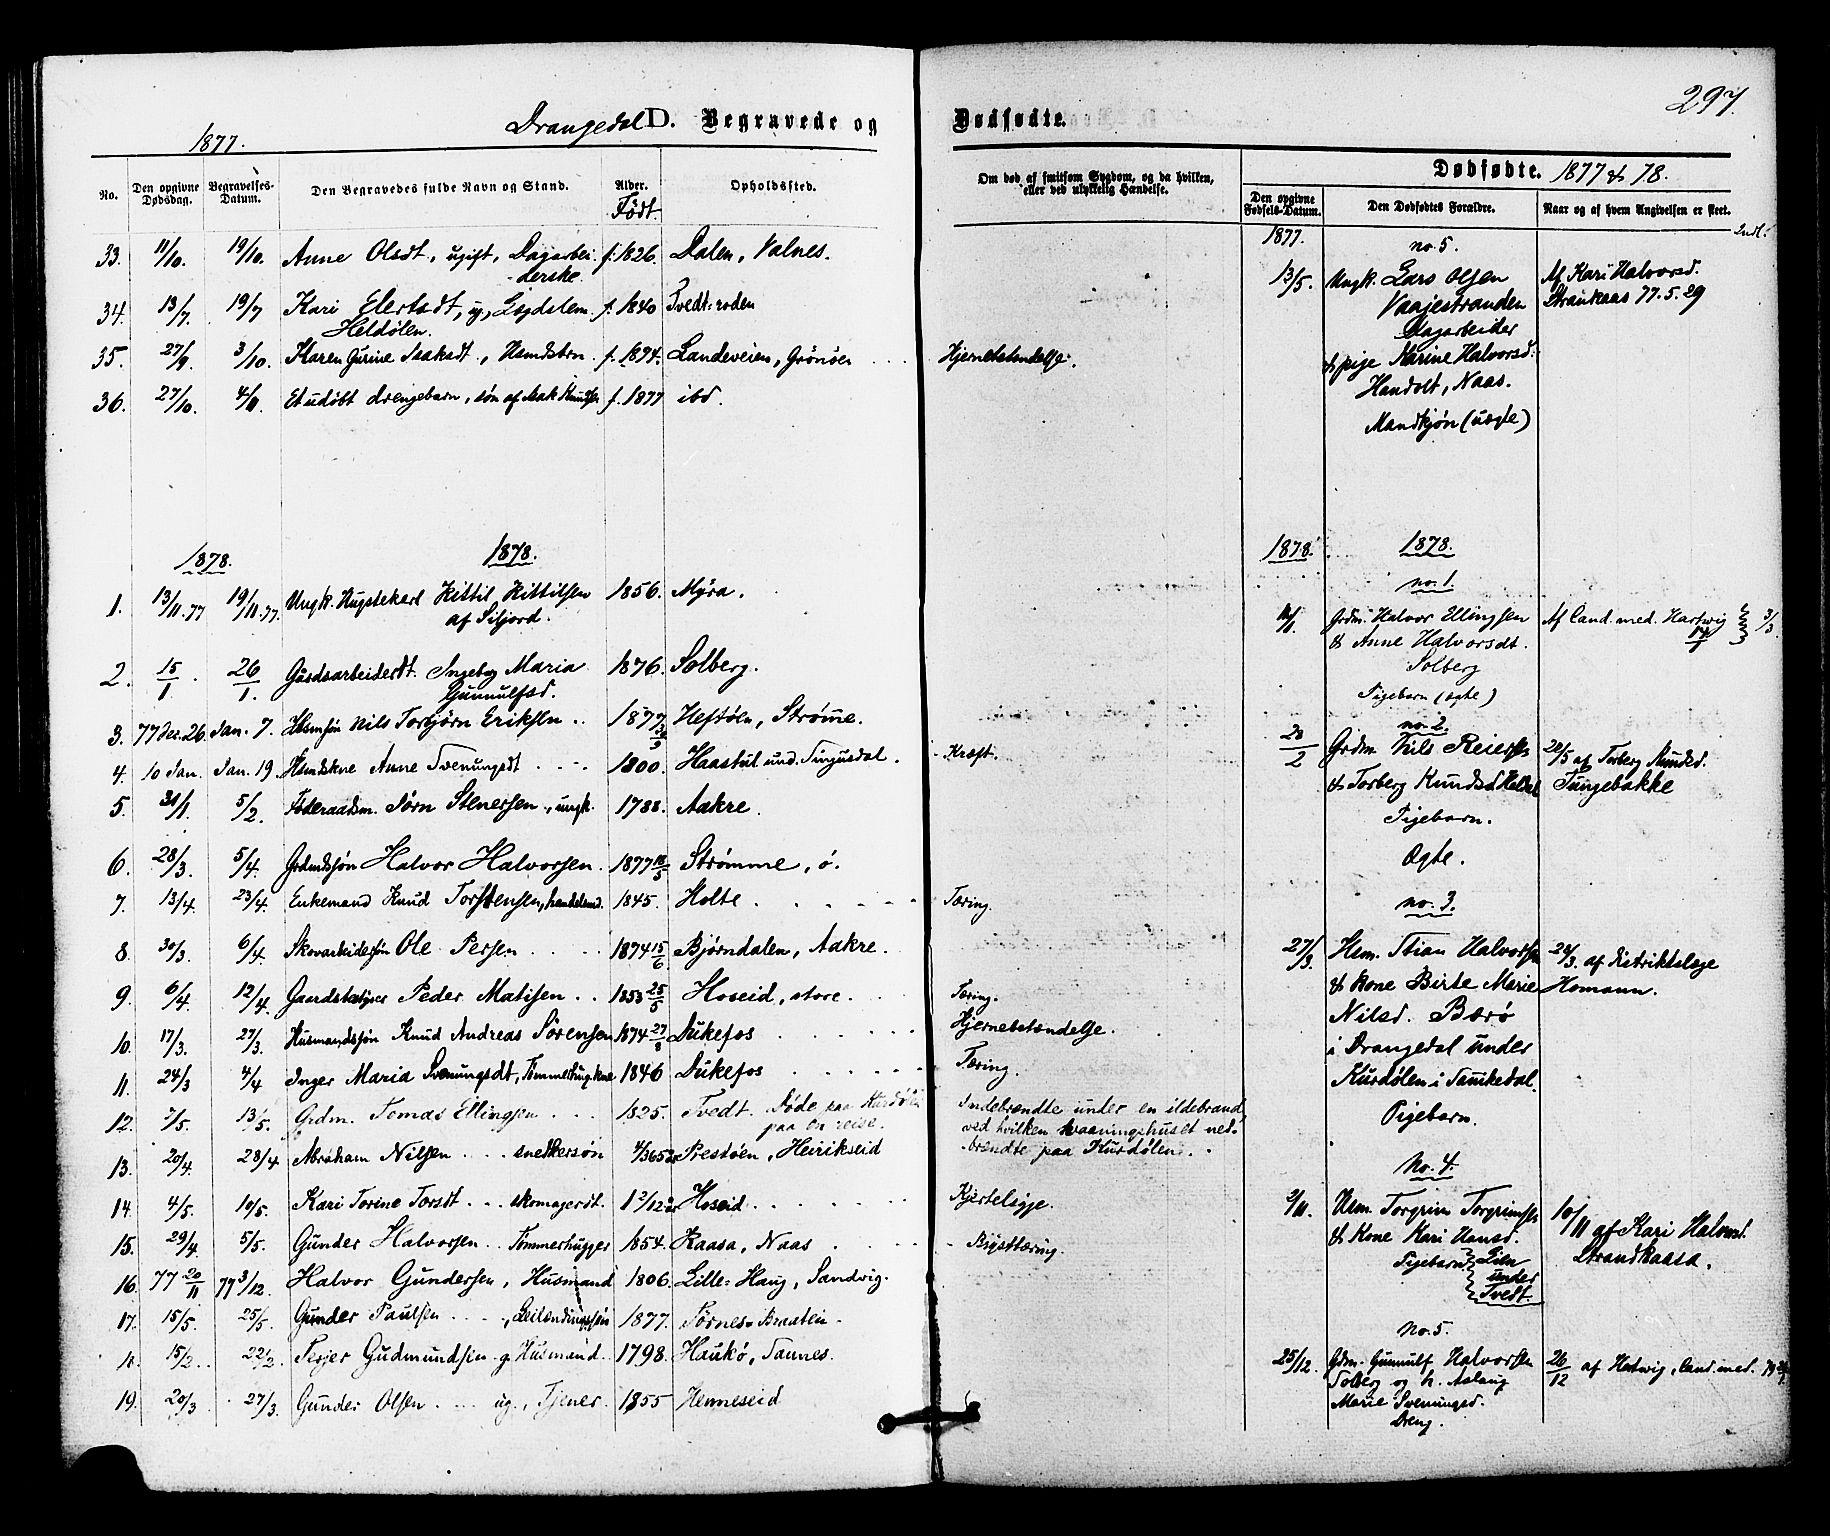 SAKO, Drangedal kirkebøker, F/Fa/L0009: Ministerialbok nr. 9 /1, 1872-1884, s. 297